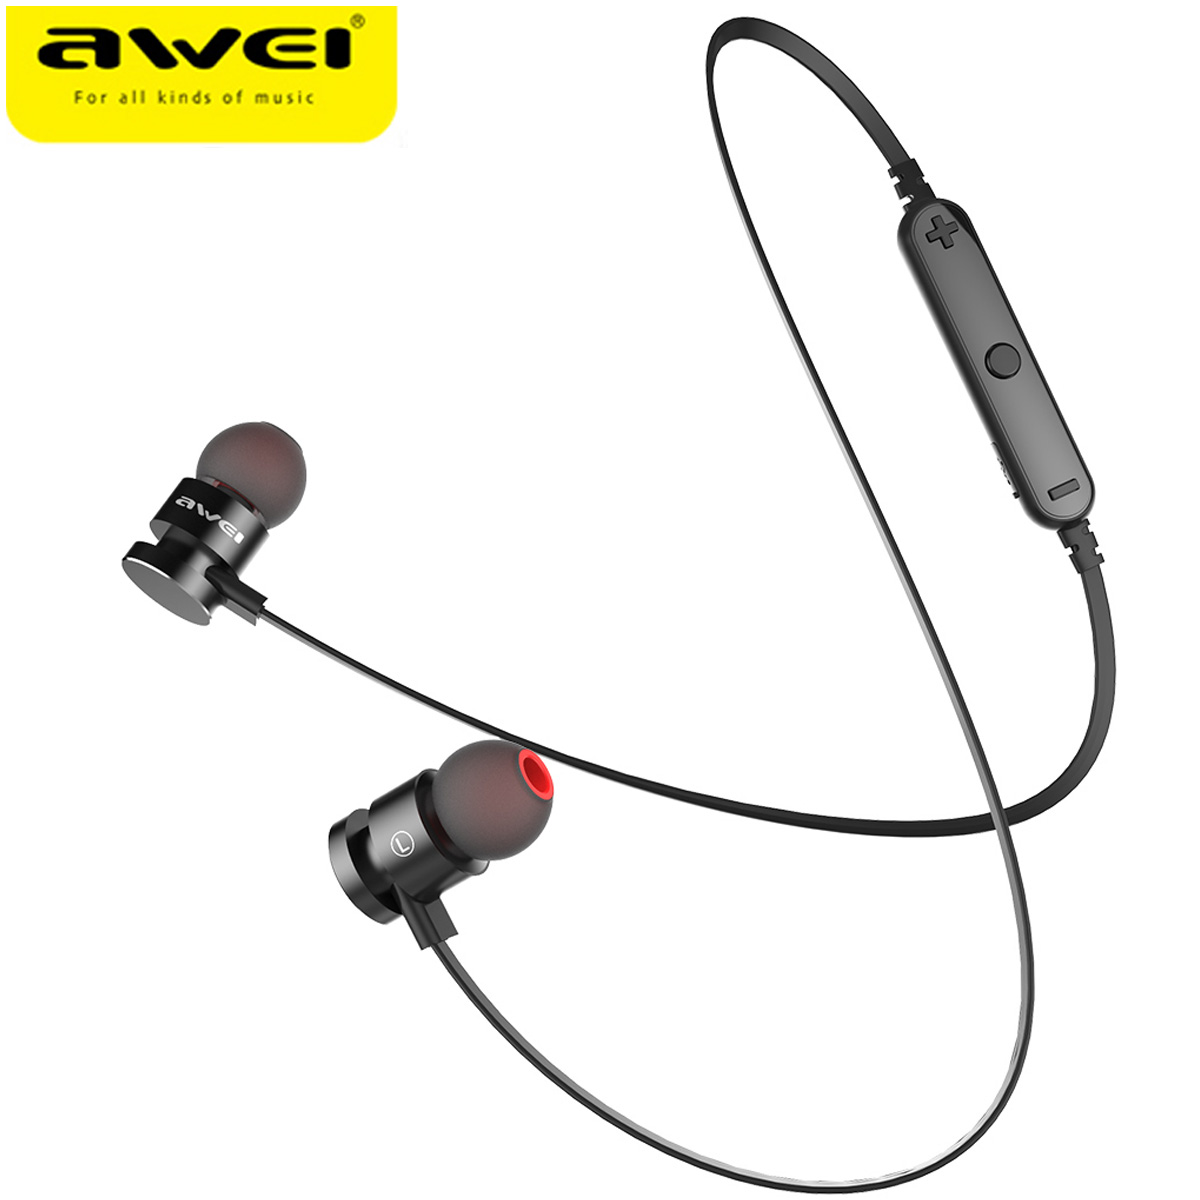 Newest AWEI T11 Wireless Headphone Bluetooth Earphone Headphone For Phone Neckband sport earphone Auriculare CSR Bluetooth V4.2